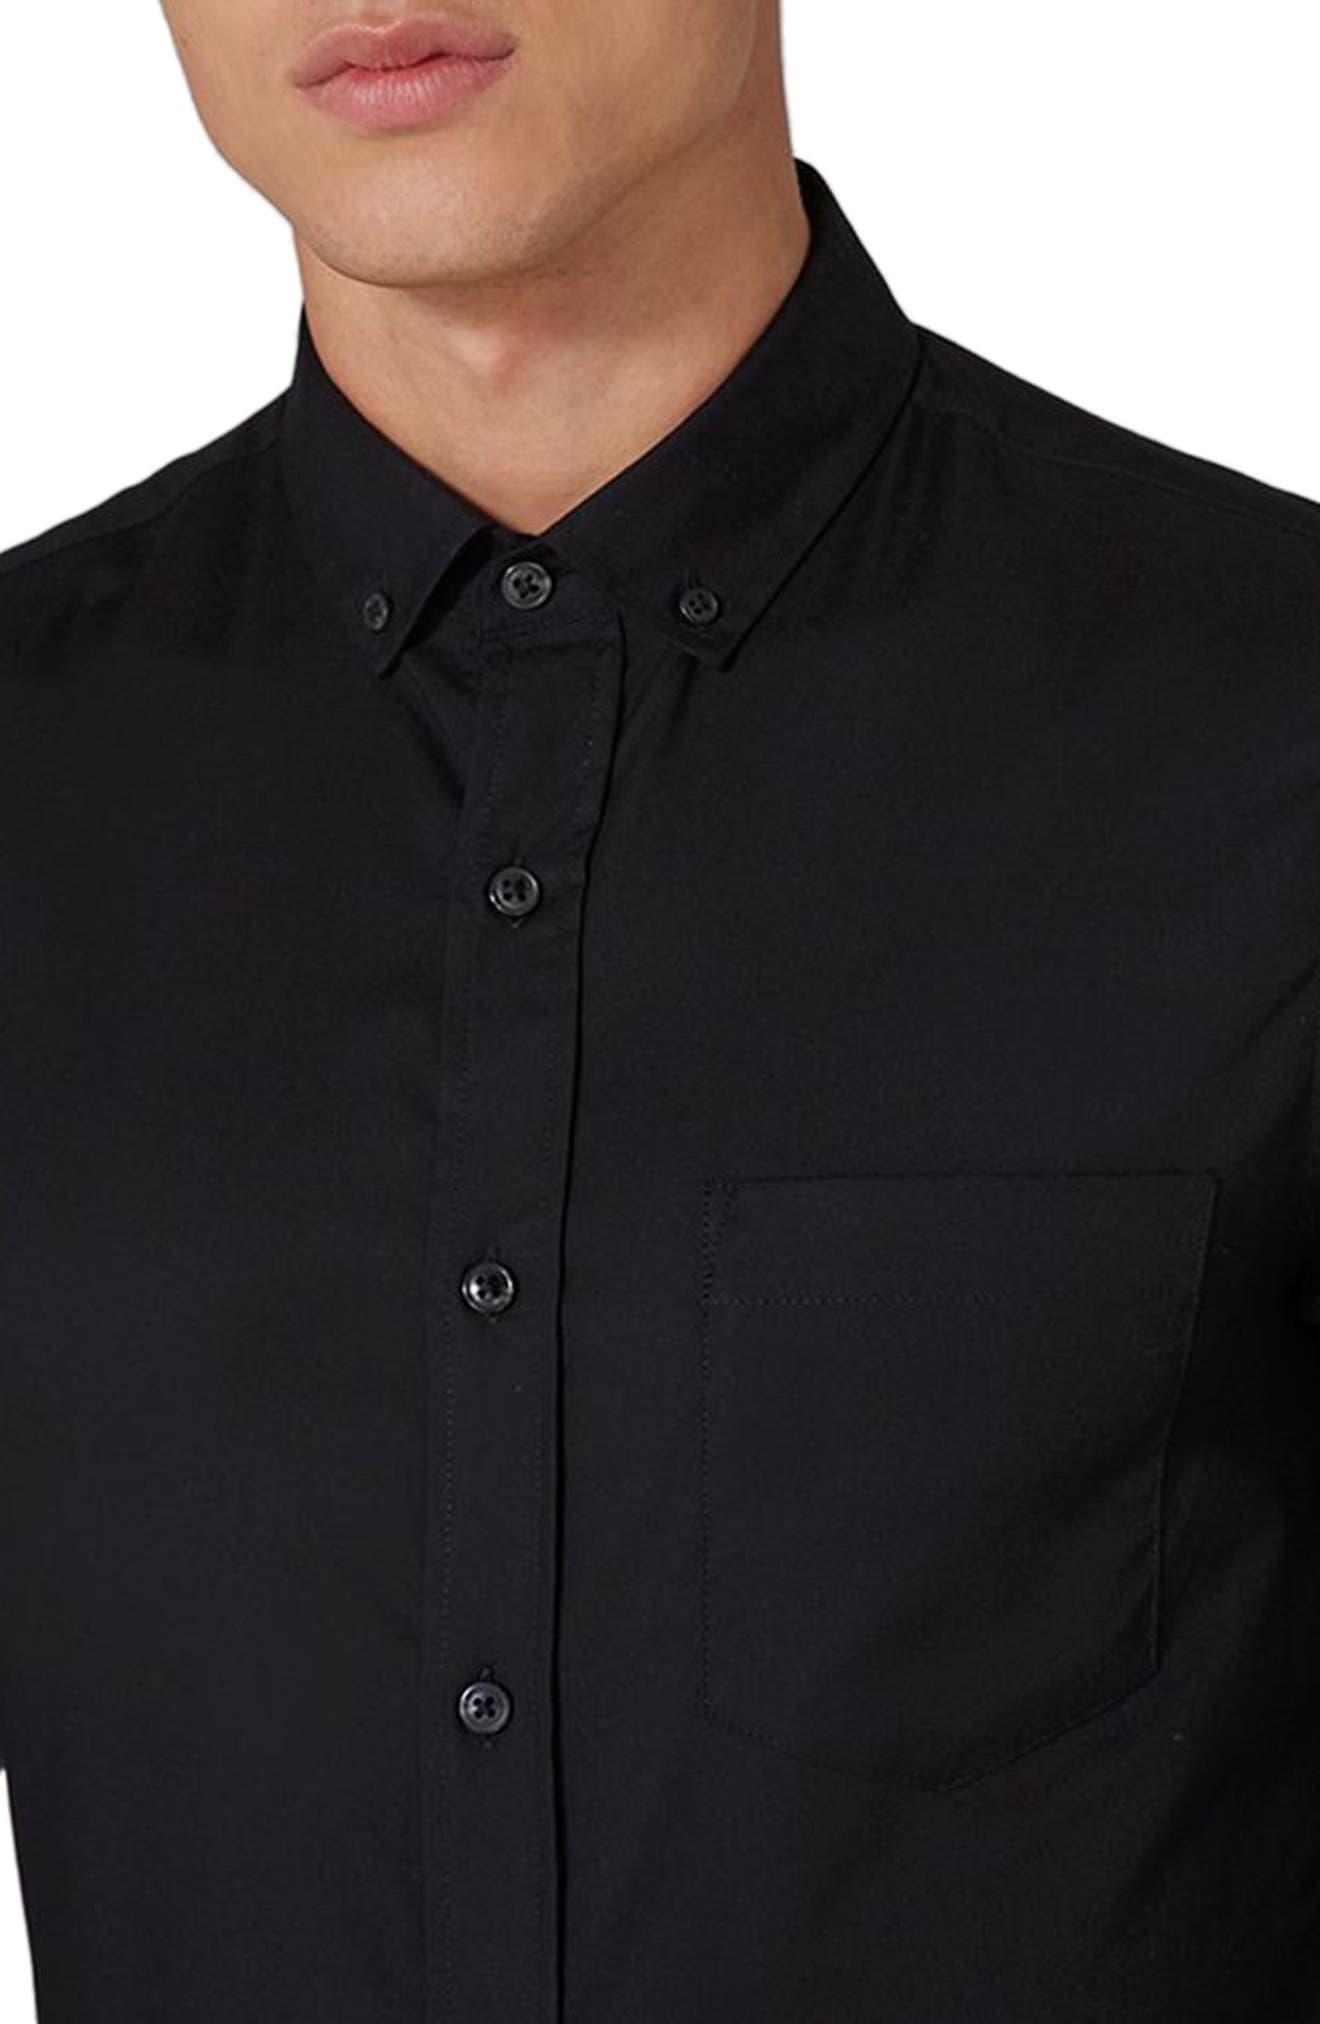 Muscle Fit Oxford Shirt,                             Alternate thumbnail 3, color,                             Black